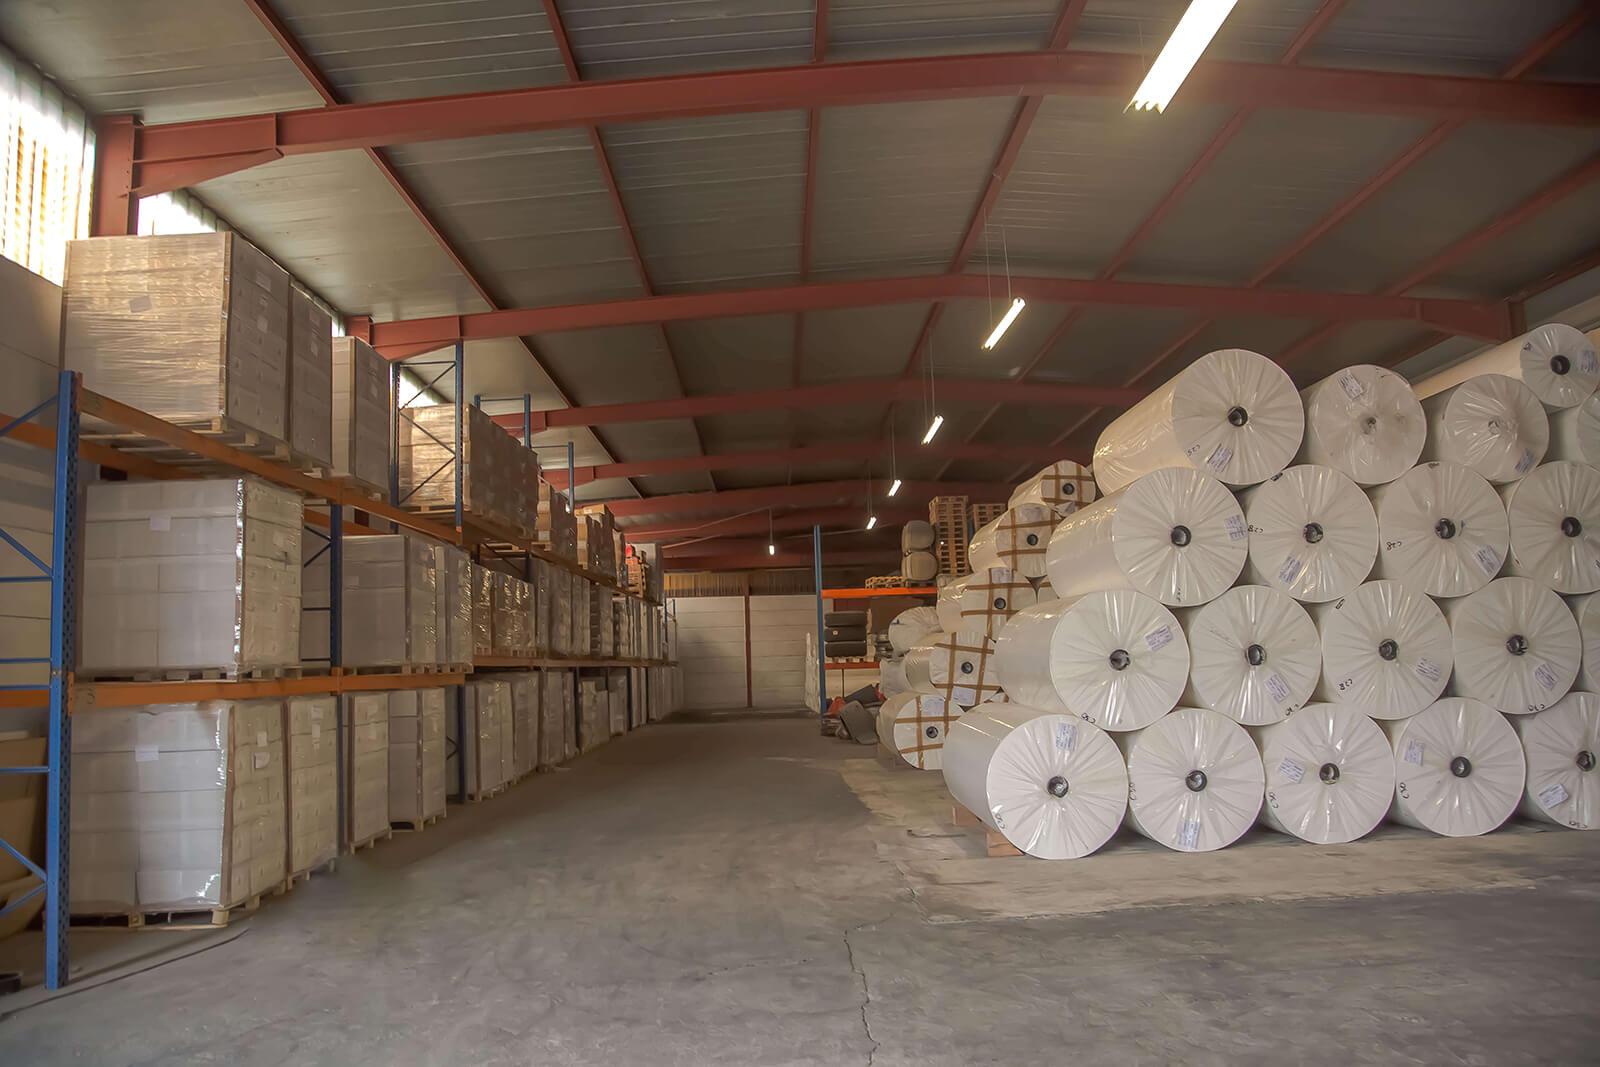 Zucarlux recyclage concassage province de Luxembourg